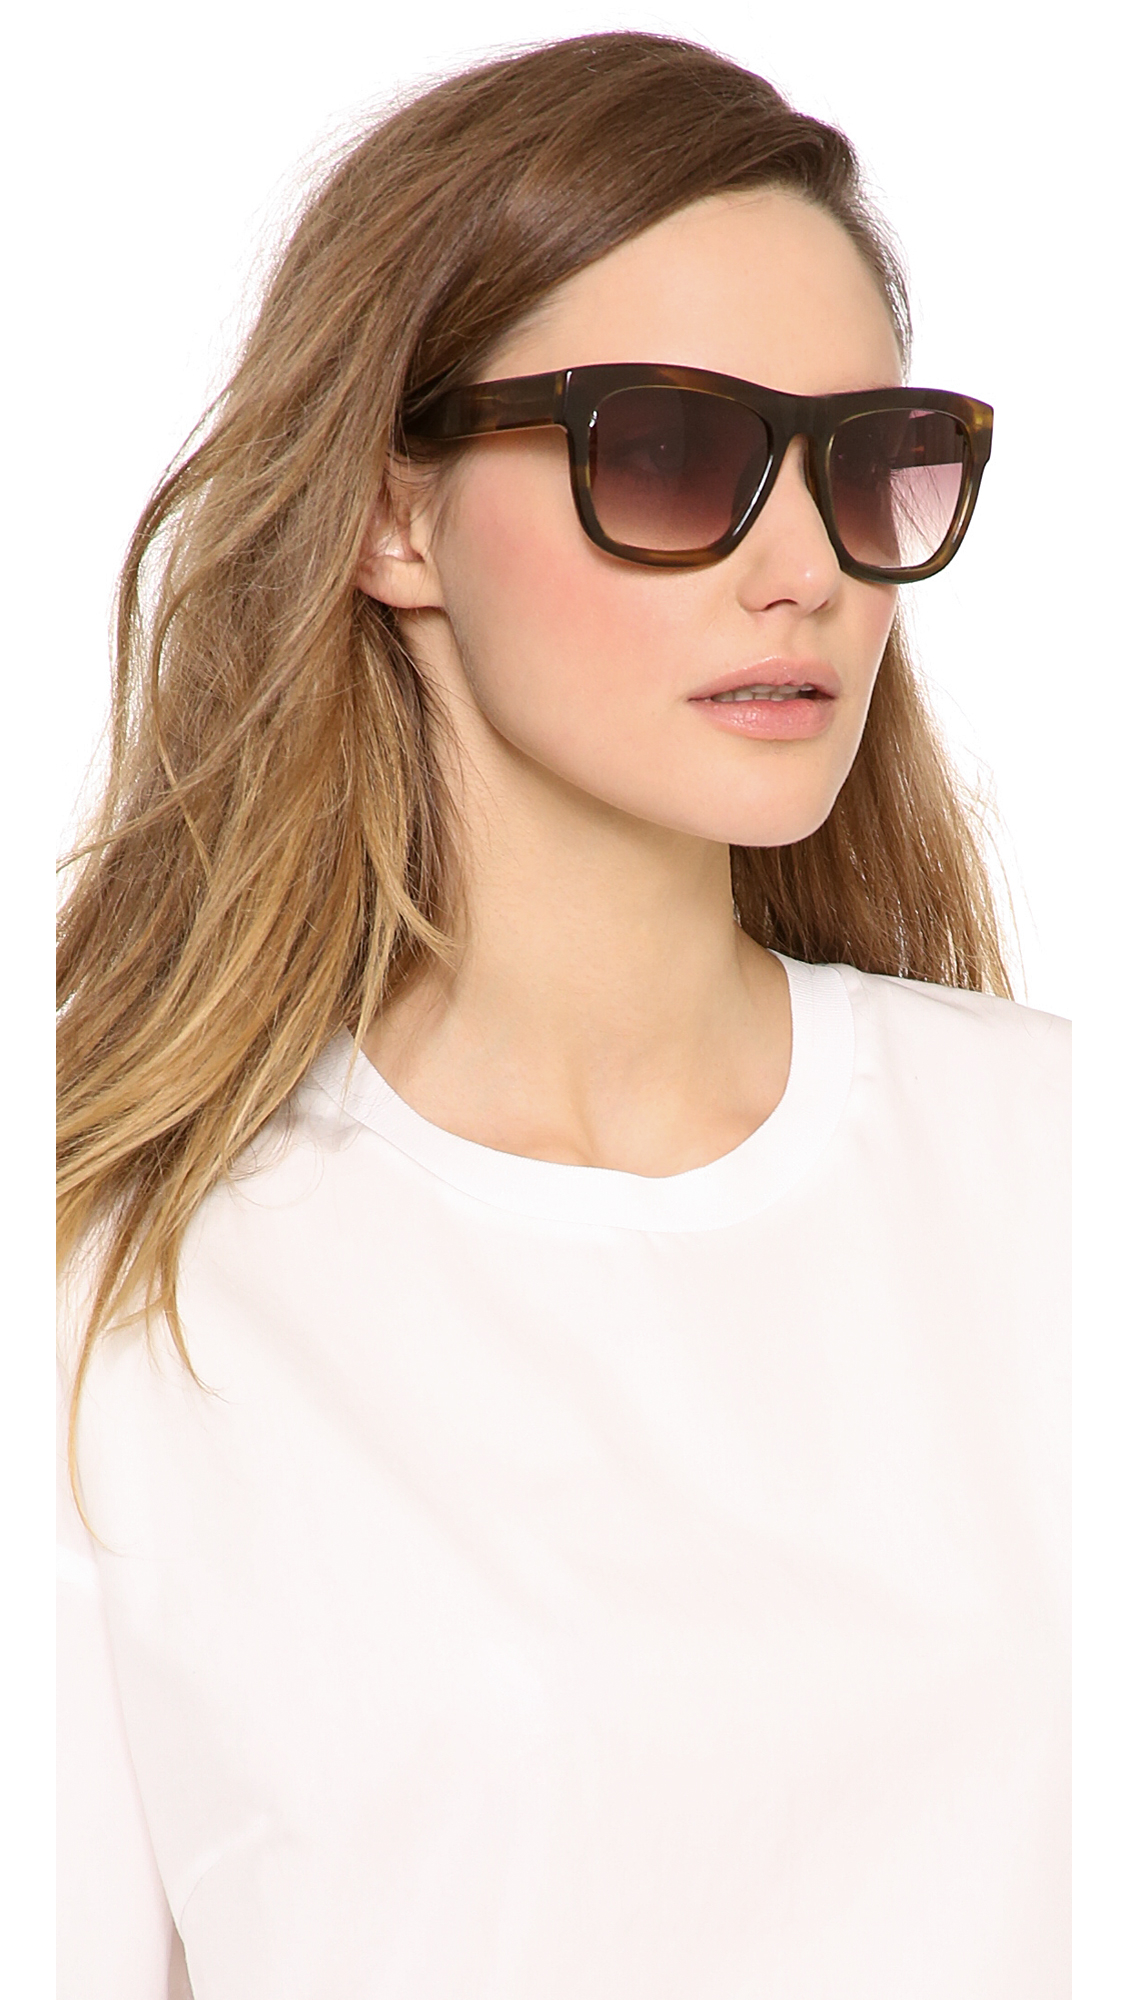 3.1 Phillip Lim Cat Eye Tinted Sunglasses - Rose gold 3.1 Phillip Lim aqpqANevG